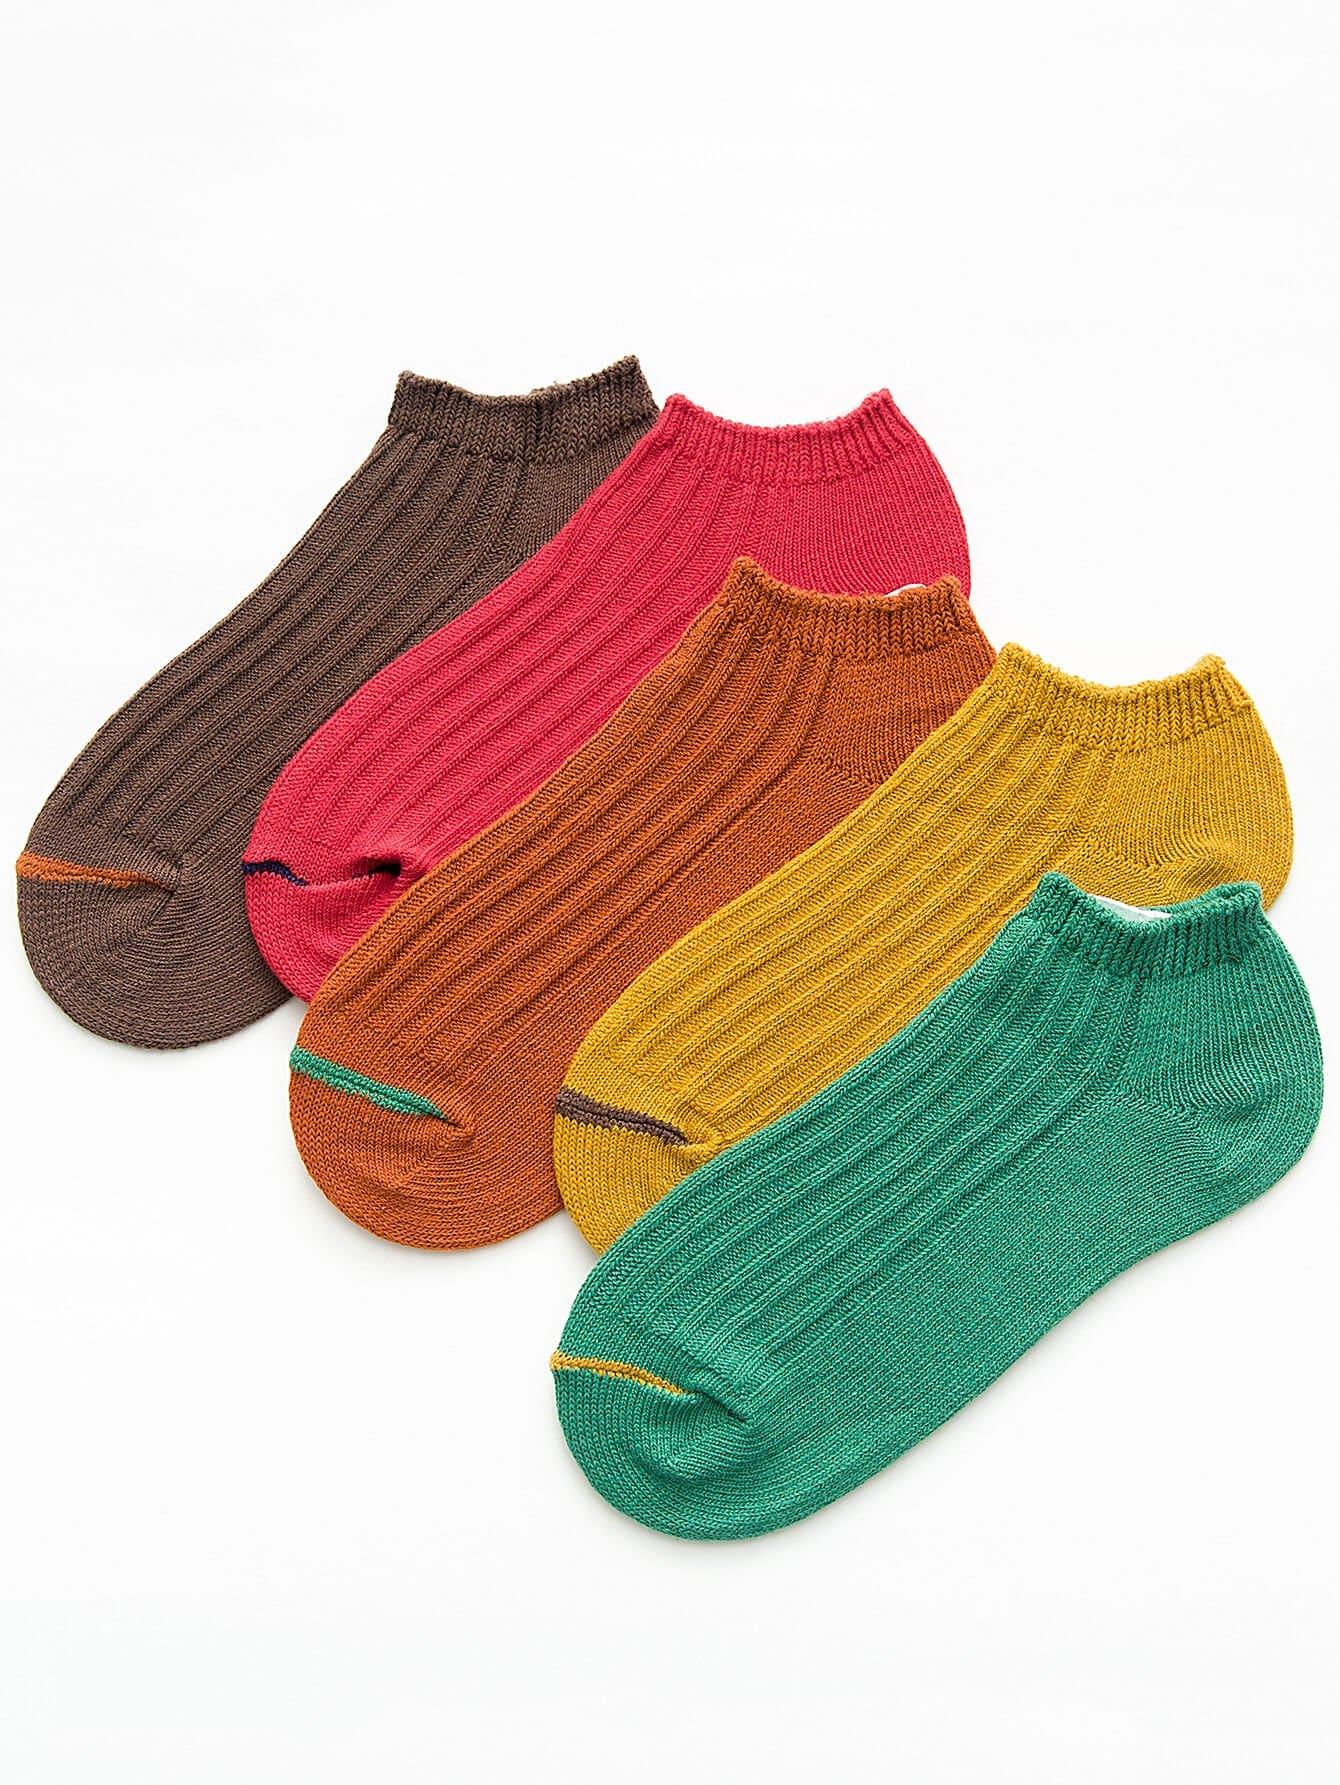 Нервюры носки 5пары